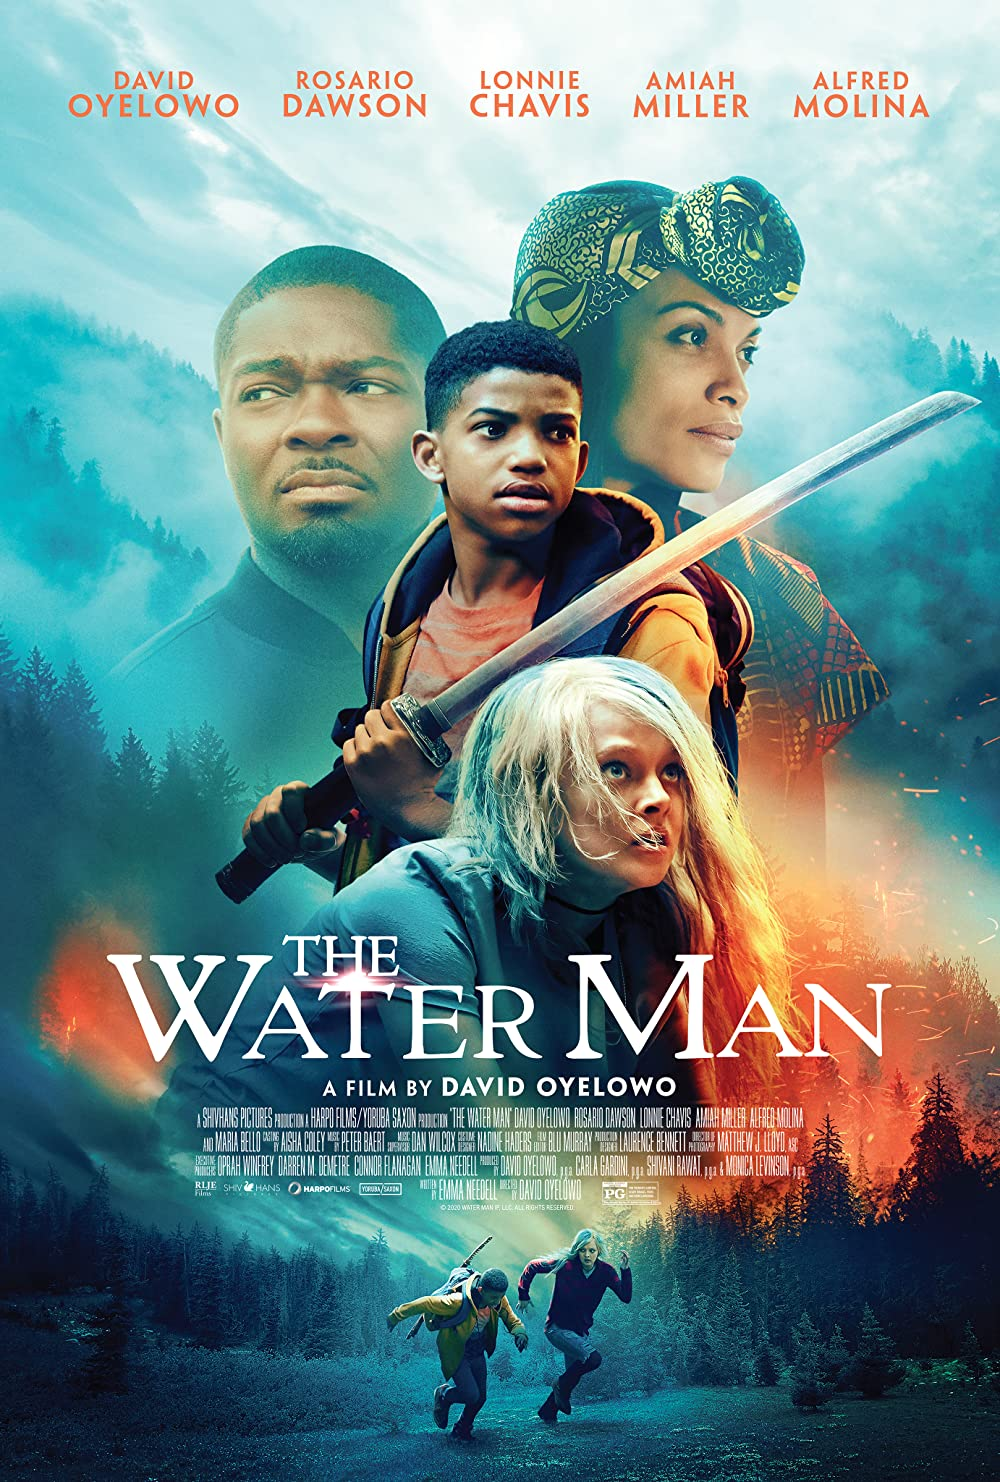 The Water Man 2021 Hindi Dubbed 300MB HDRip 480p Free Download